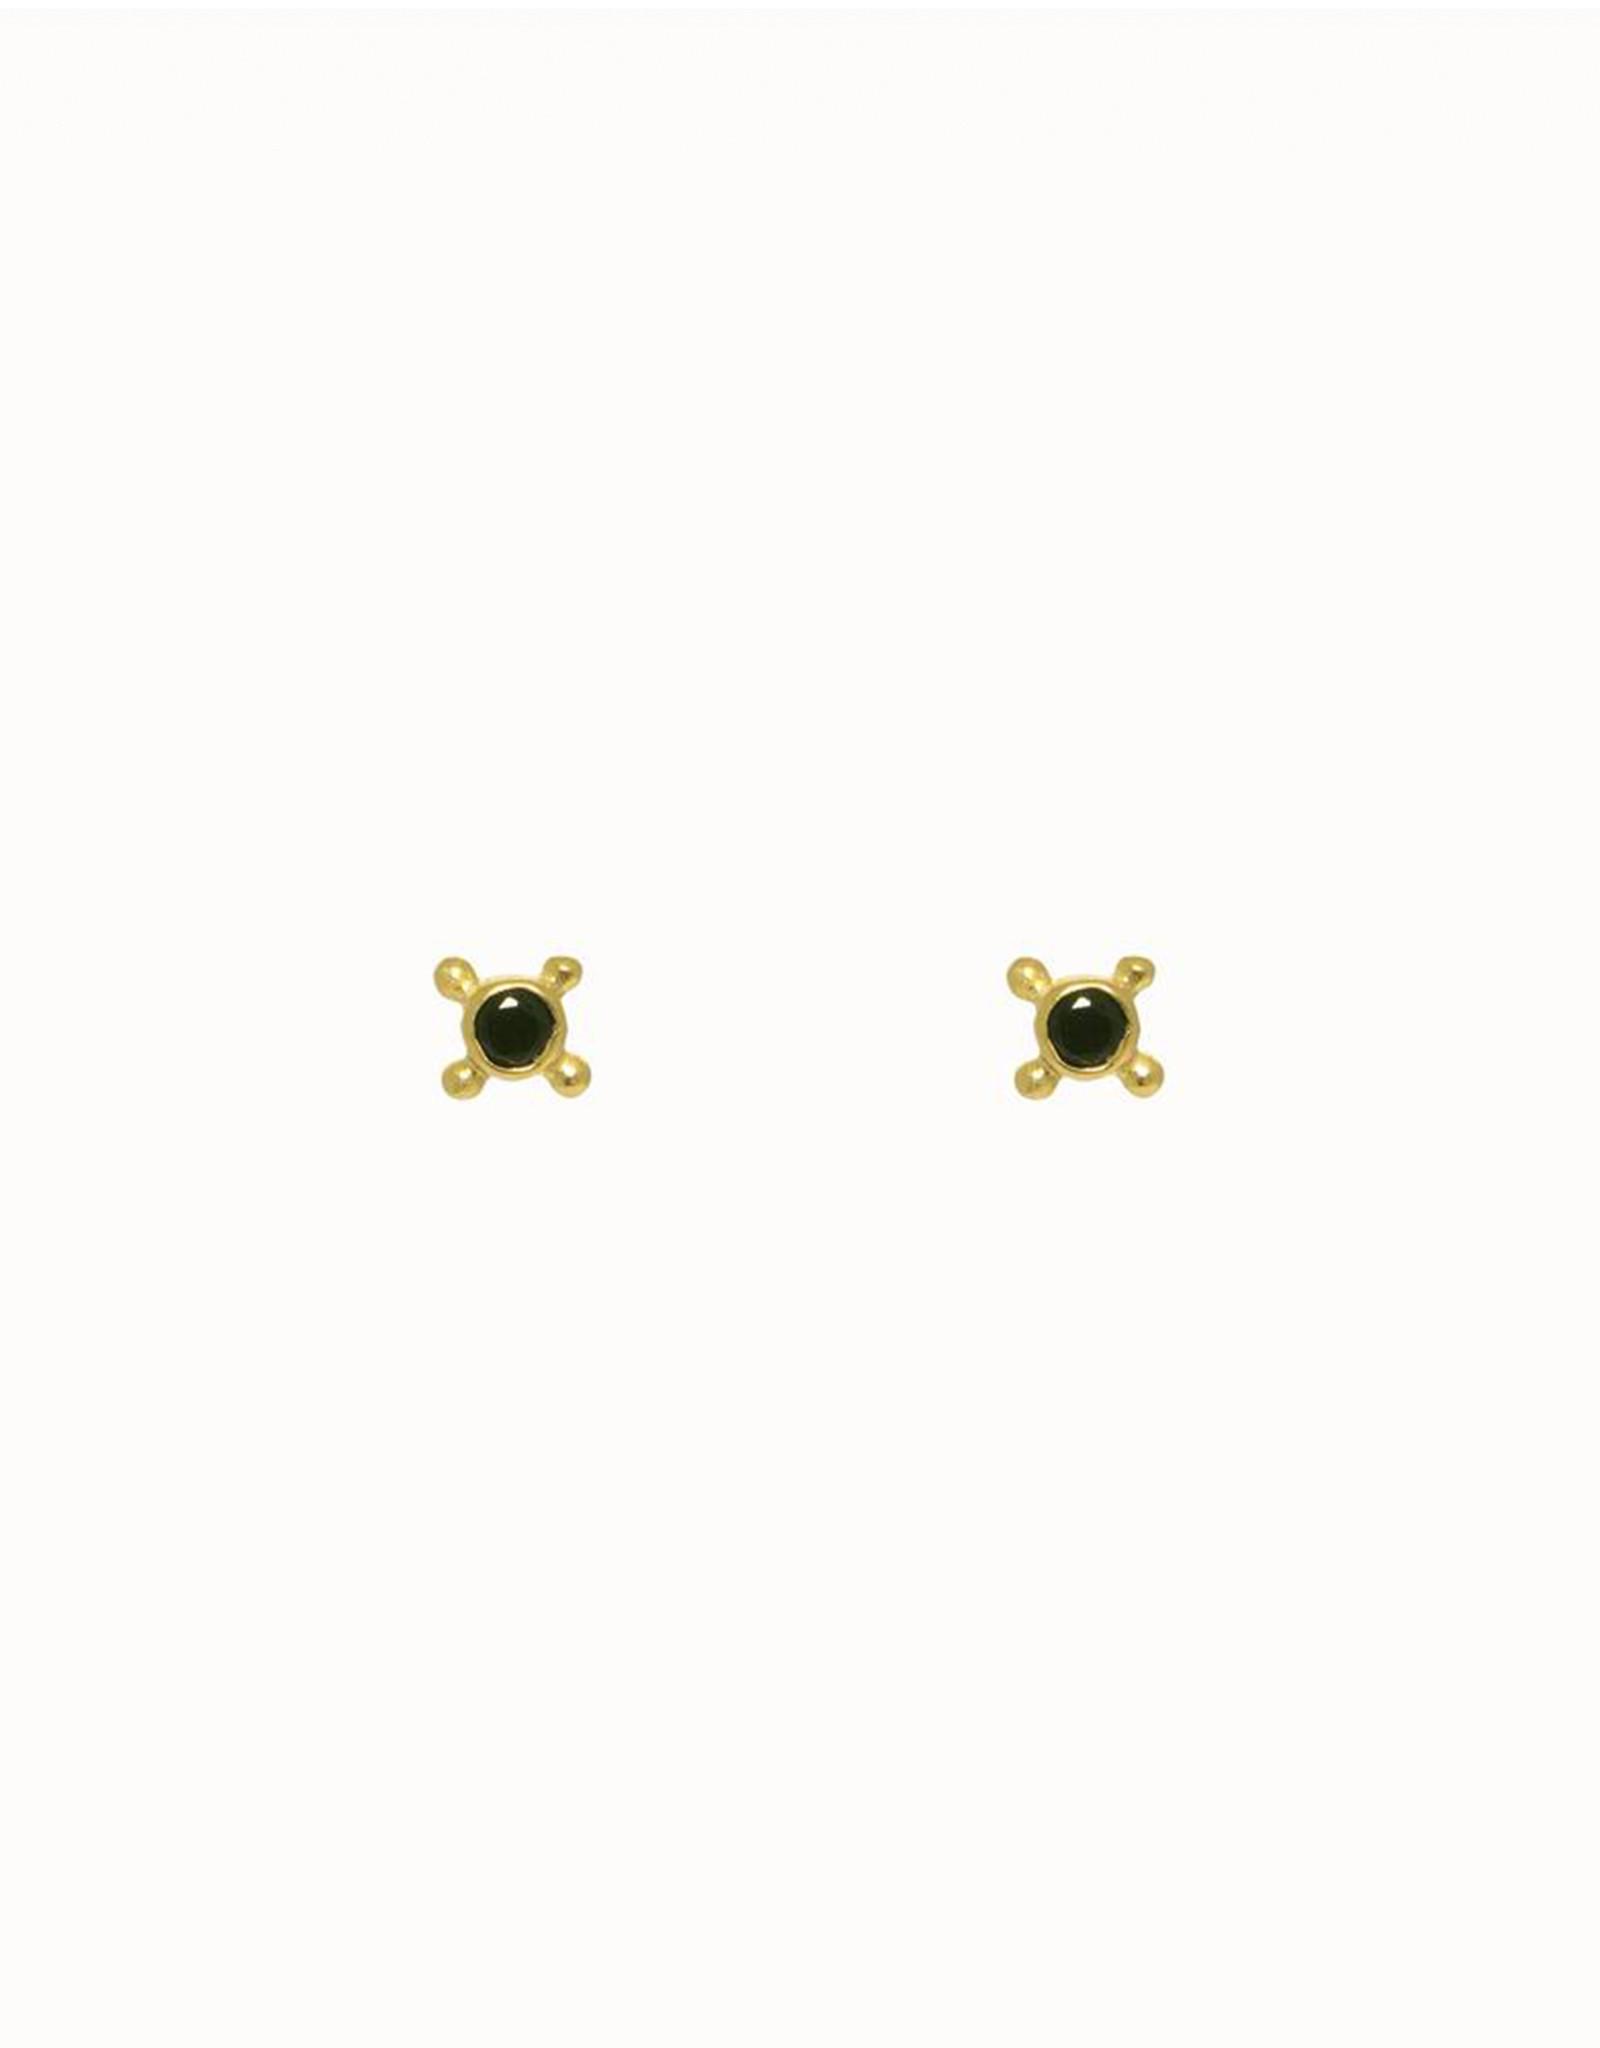 Flawed Indulgence Studs-gold/black